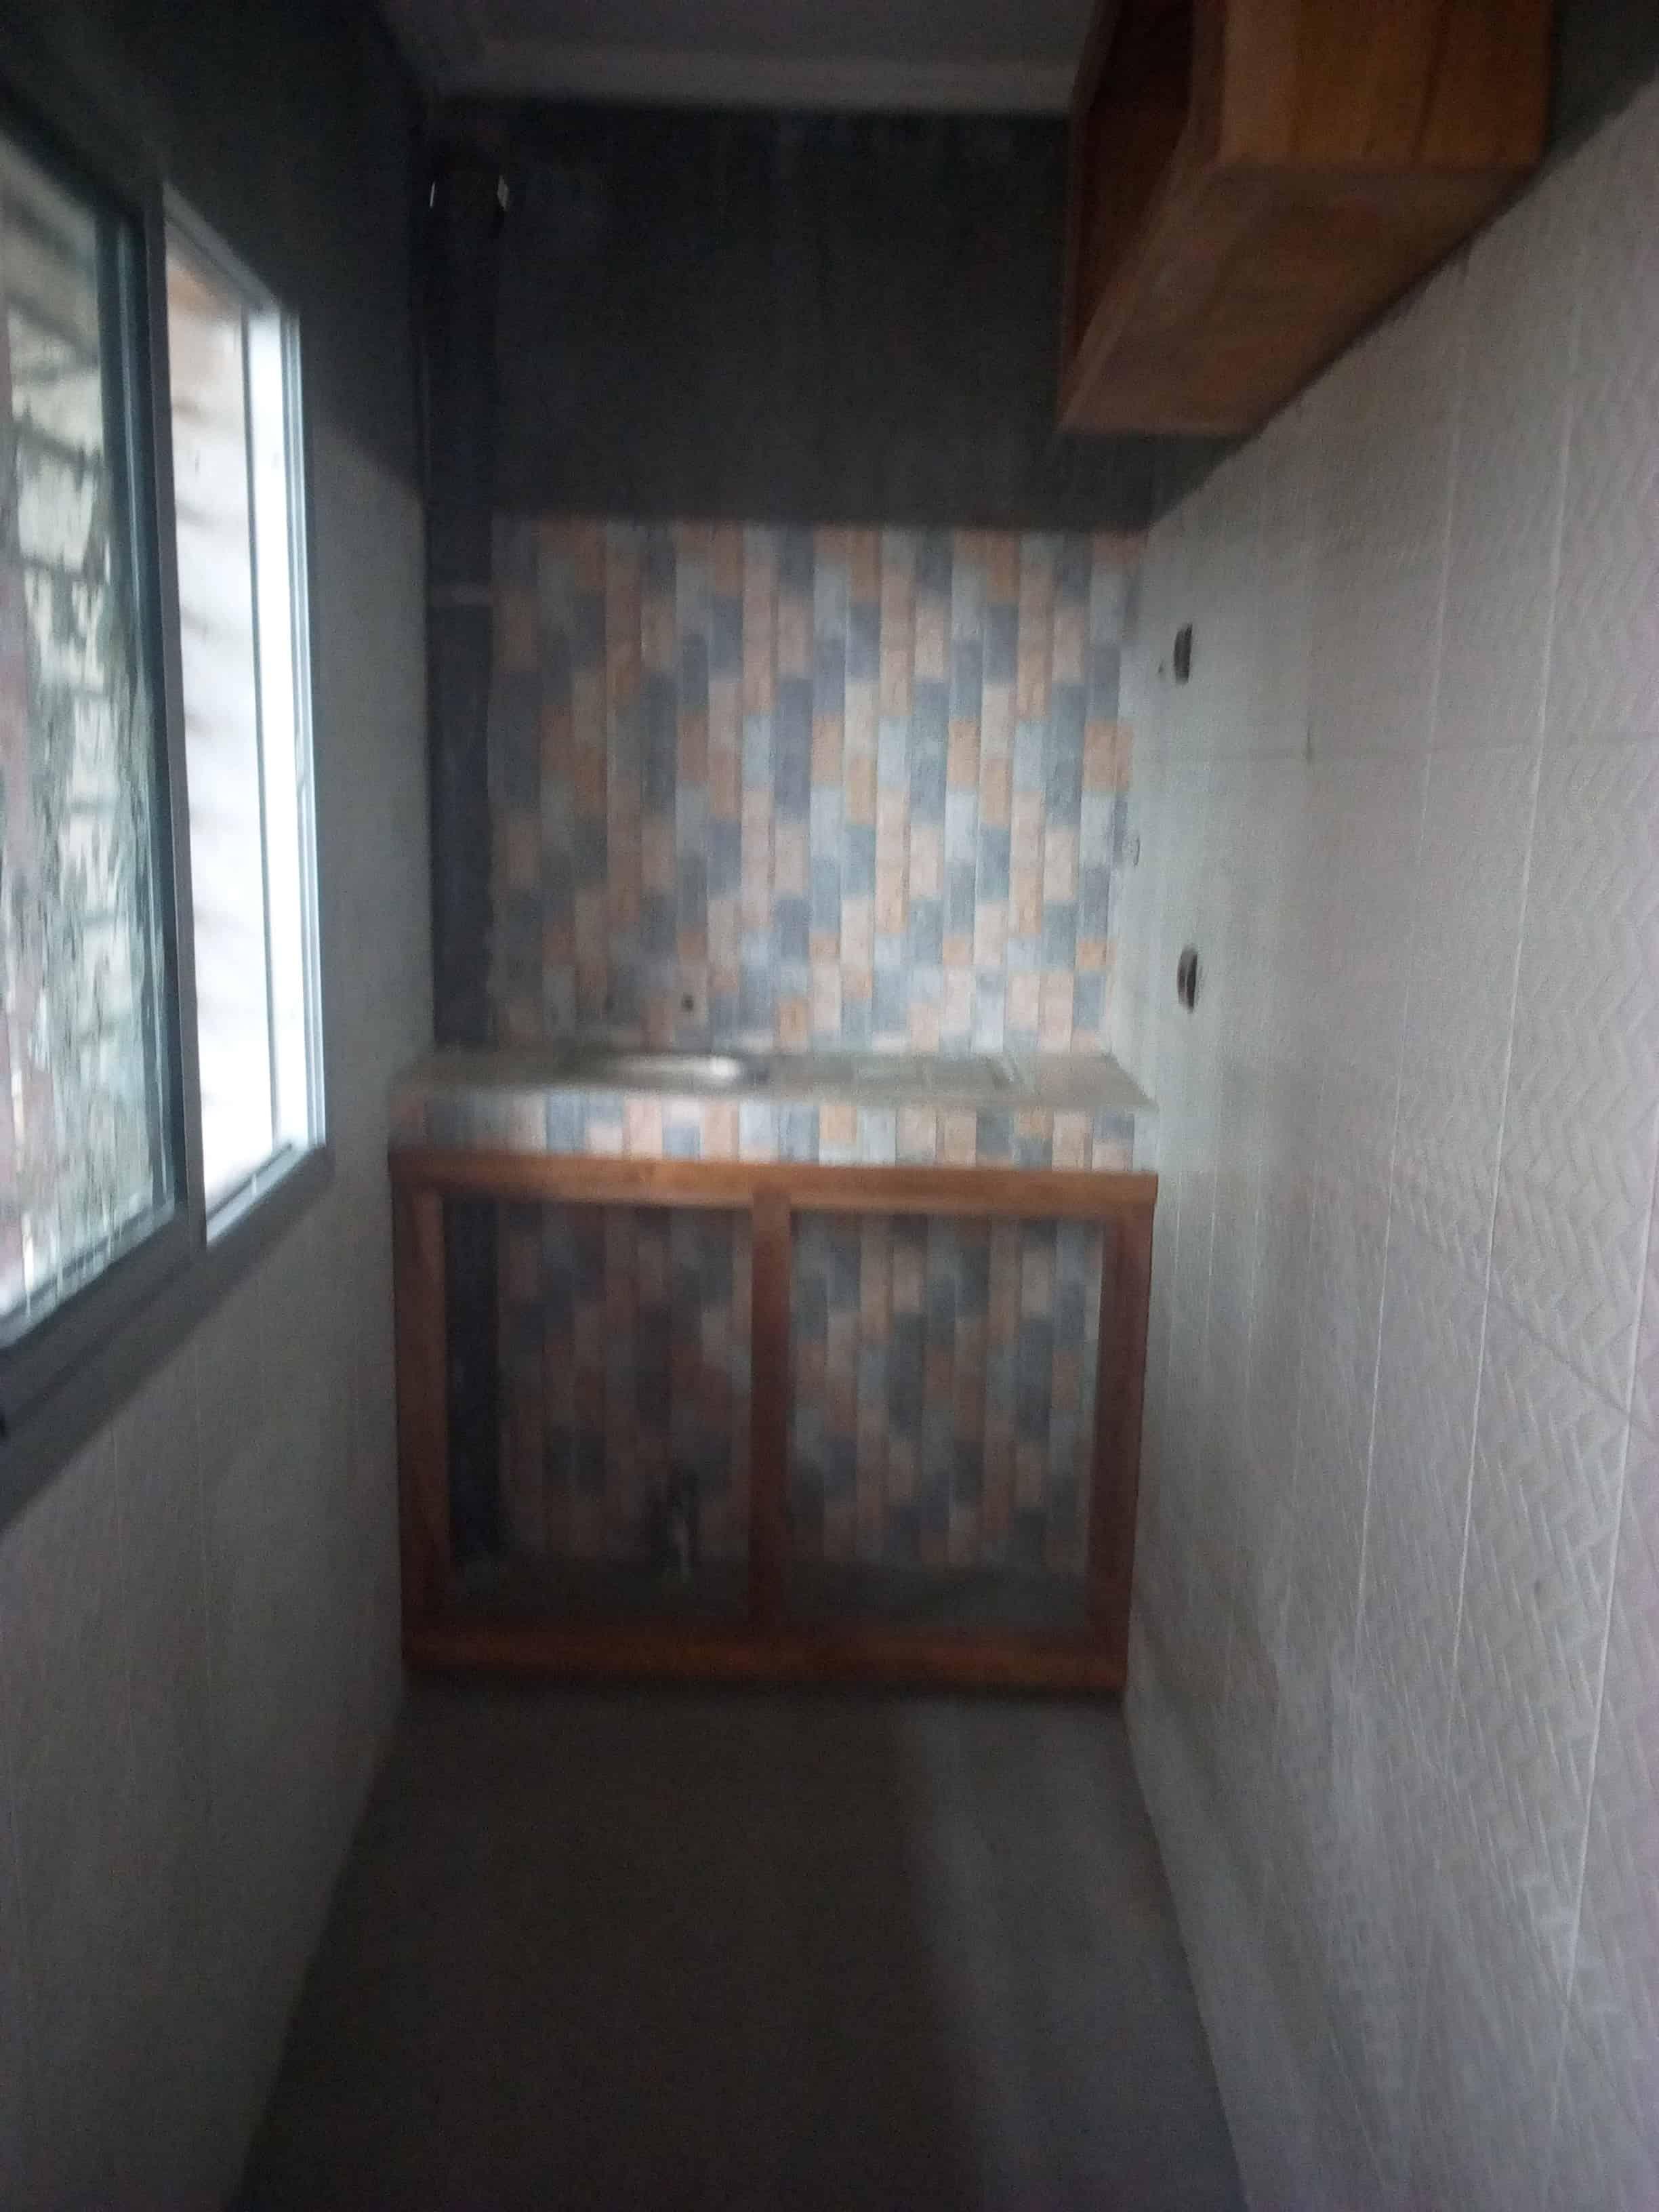 Apartment to rent - Douala, Logpom, Basson - 1 living room(s), 1 bedroom(s), 1 bathroom(s) - 70 000 FCFA / month